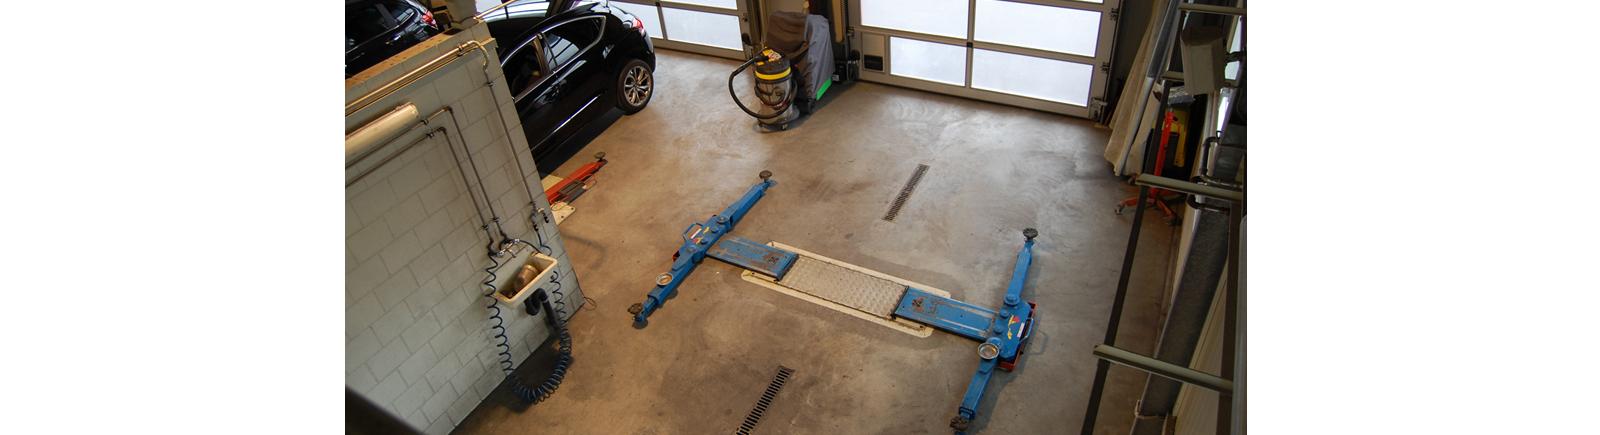 Werkstatt 2 slider